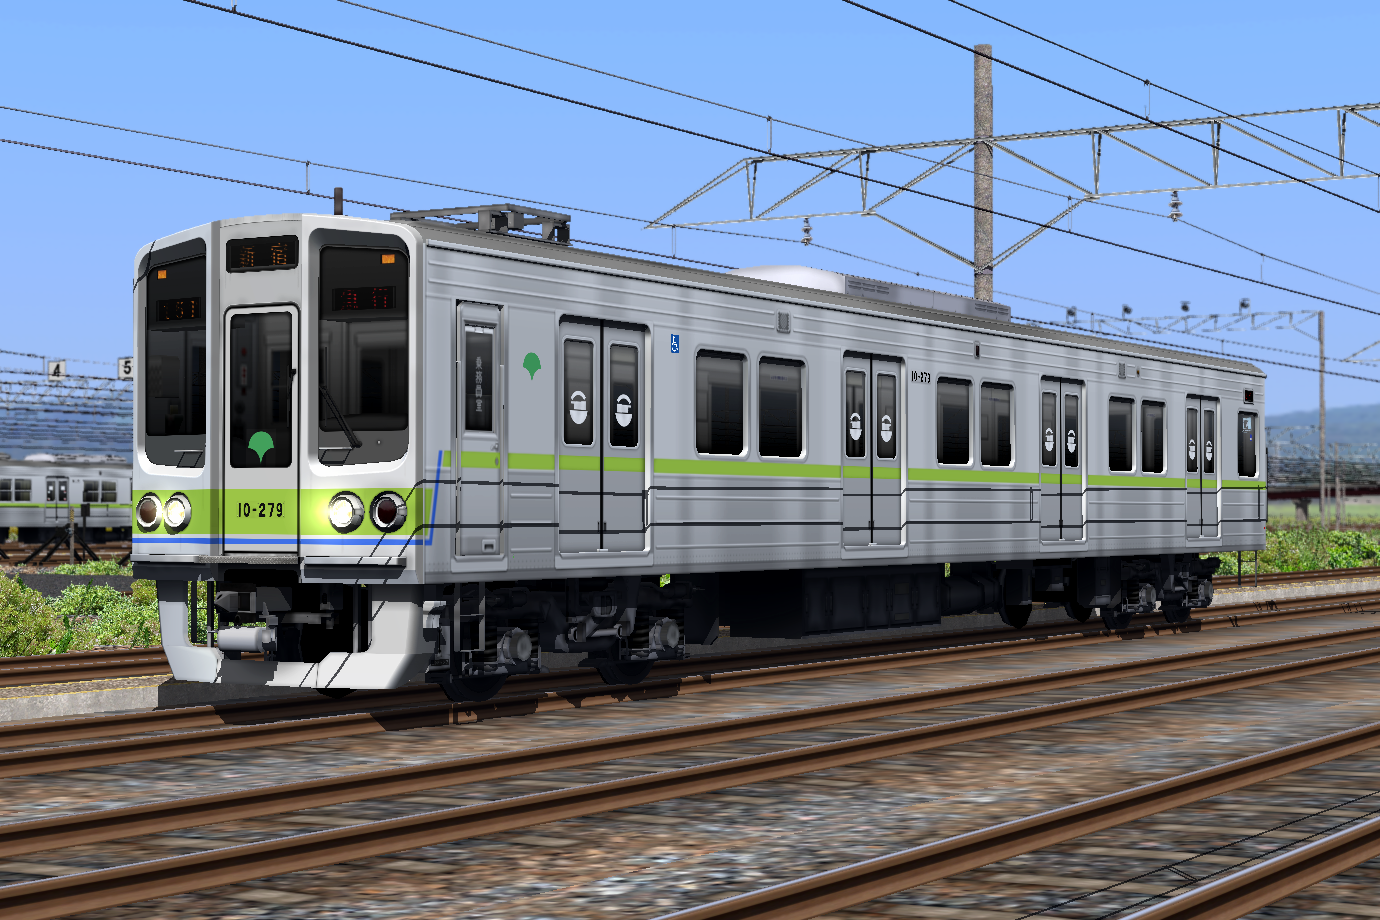 RailSim-解説]東京都交通局10-000形(Ver 2.0) 取扱説明 | しろまくえ ...